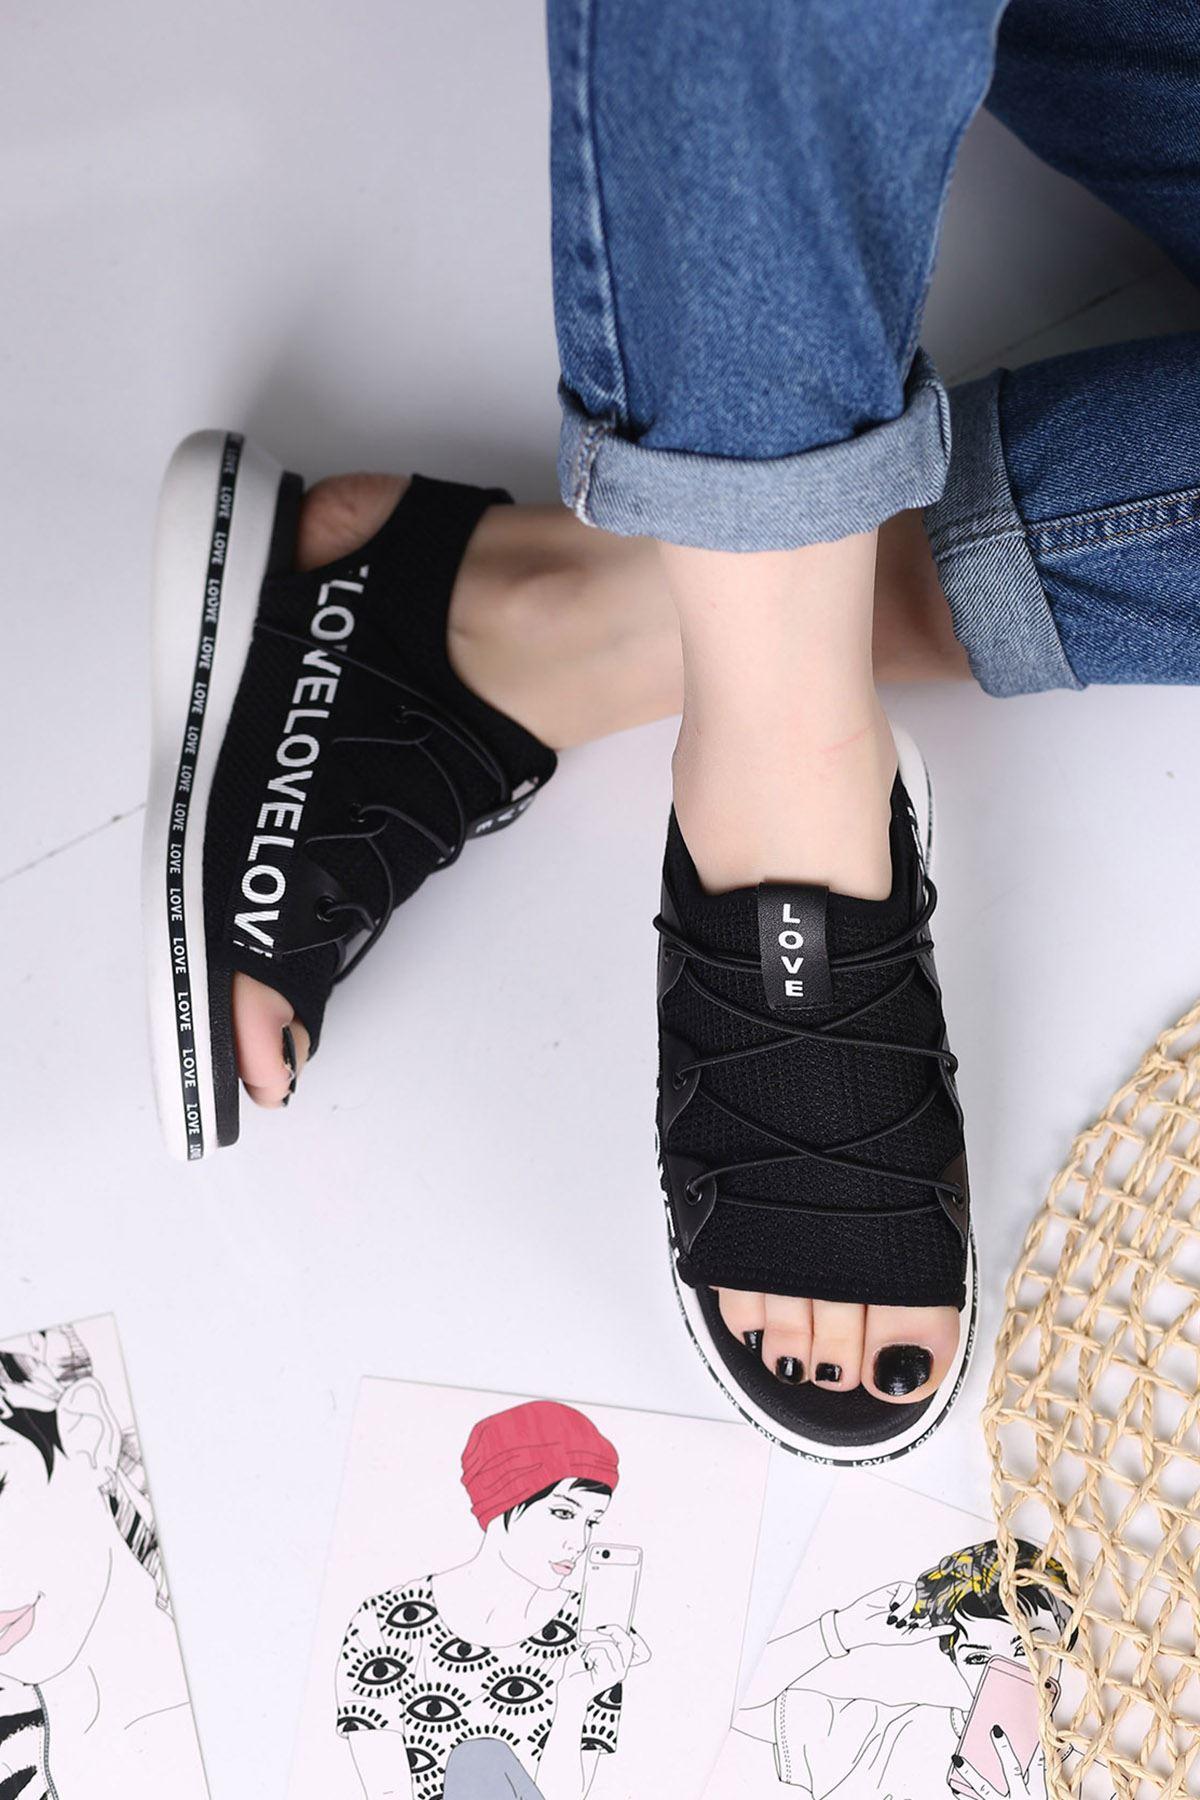 Awser Siyah Ortapedik Bayan Spor Ayakkabı